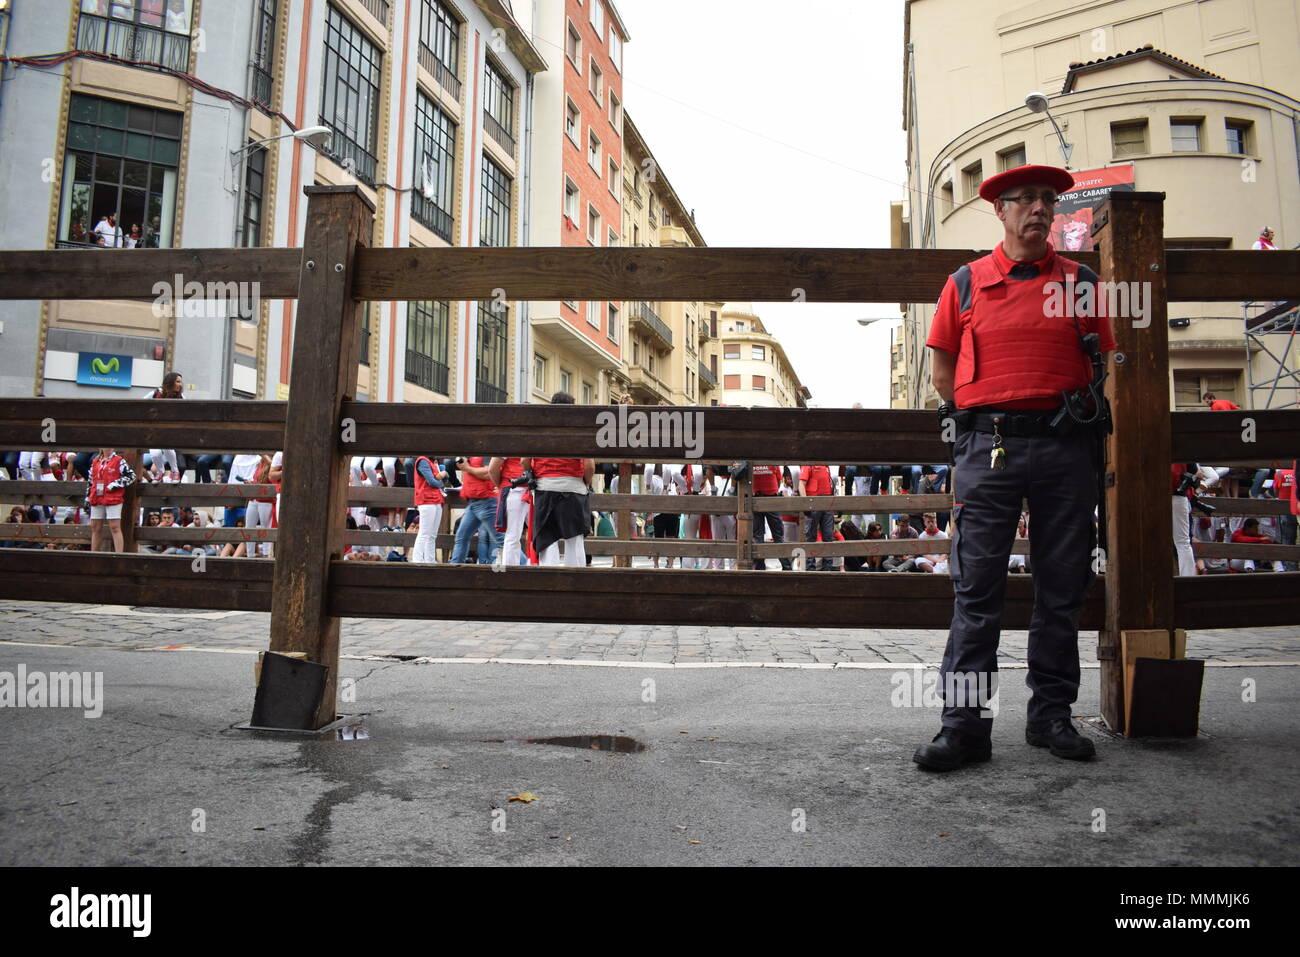 People enjoying the festival of San Fermin Stock Photo